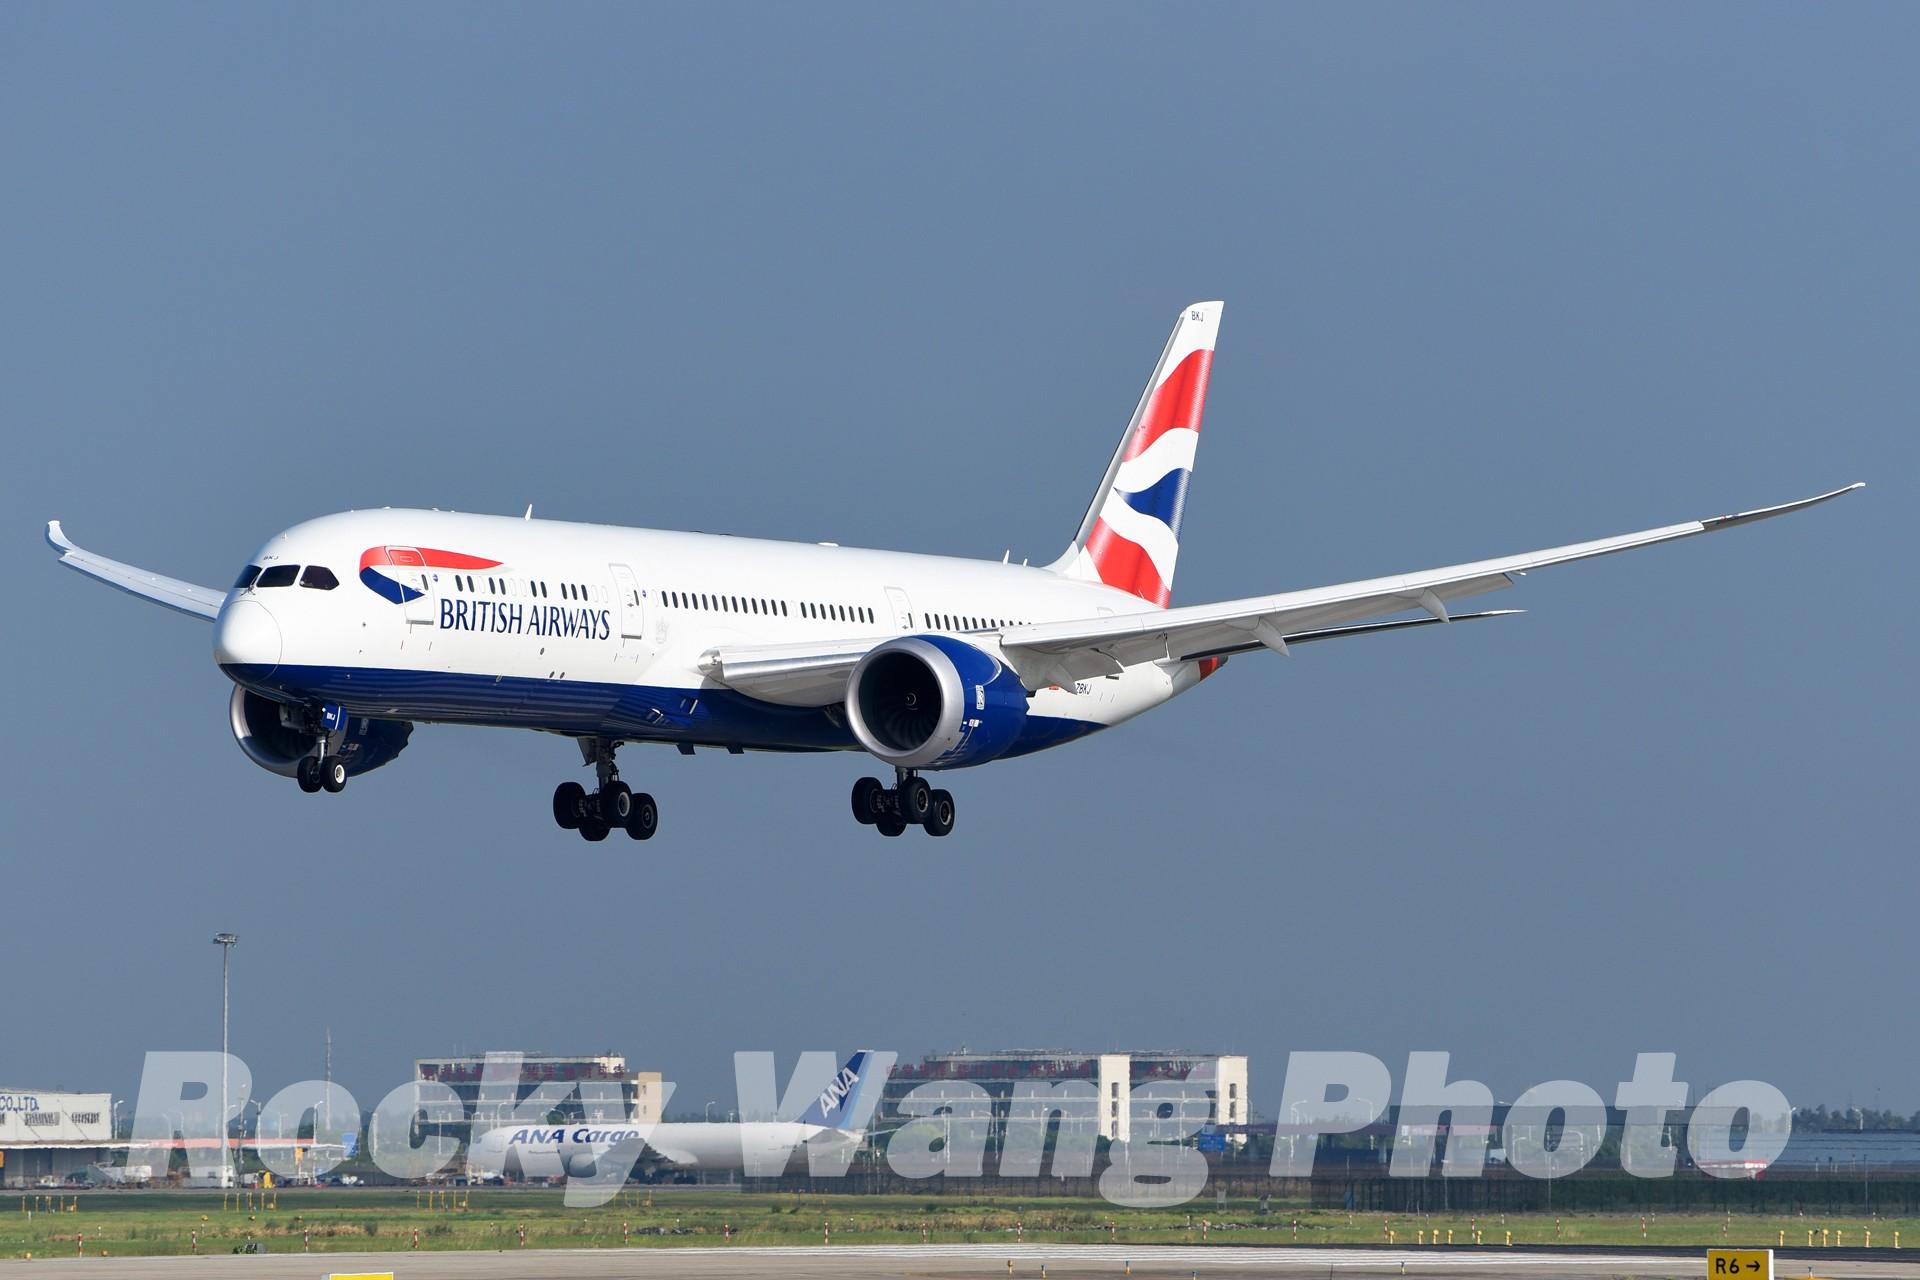 Re:[原创]即将离开787级,刷一组787 BOEING 787-9 G-ZBKJ 中国上海浦东国际机场